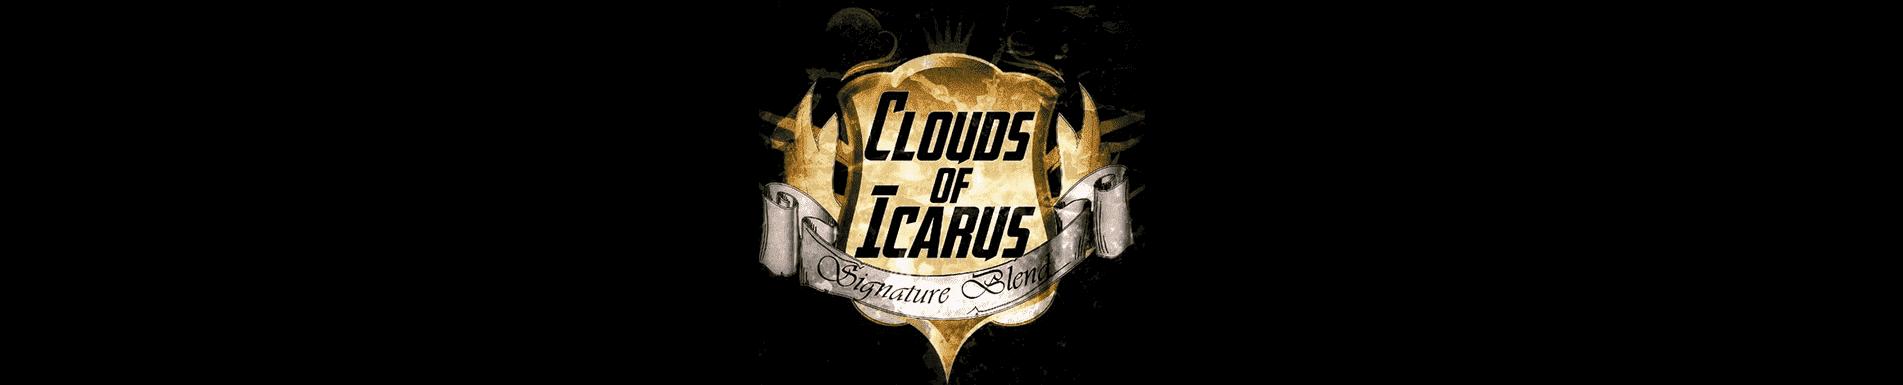 e liquide cloud of icarus